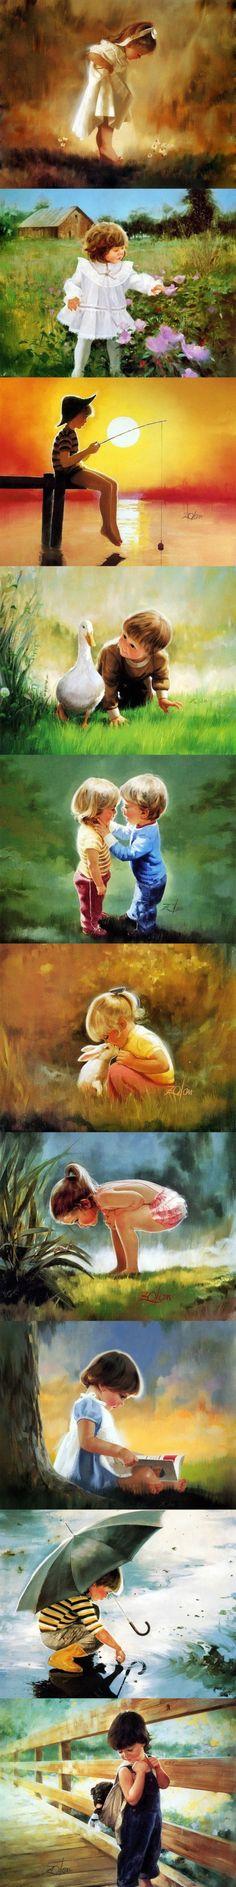 Donald Zolan Golden childhood Oil Painting